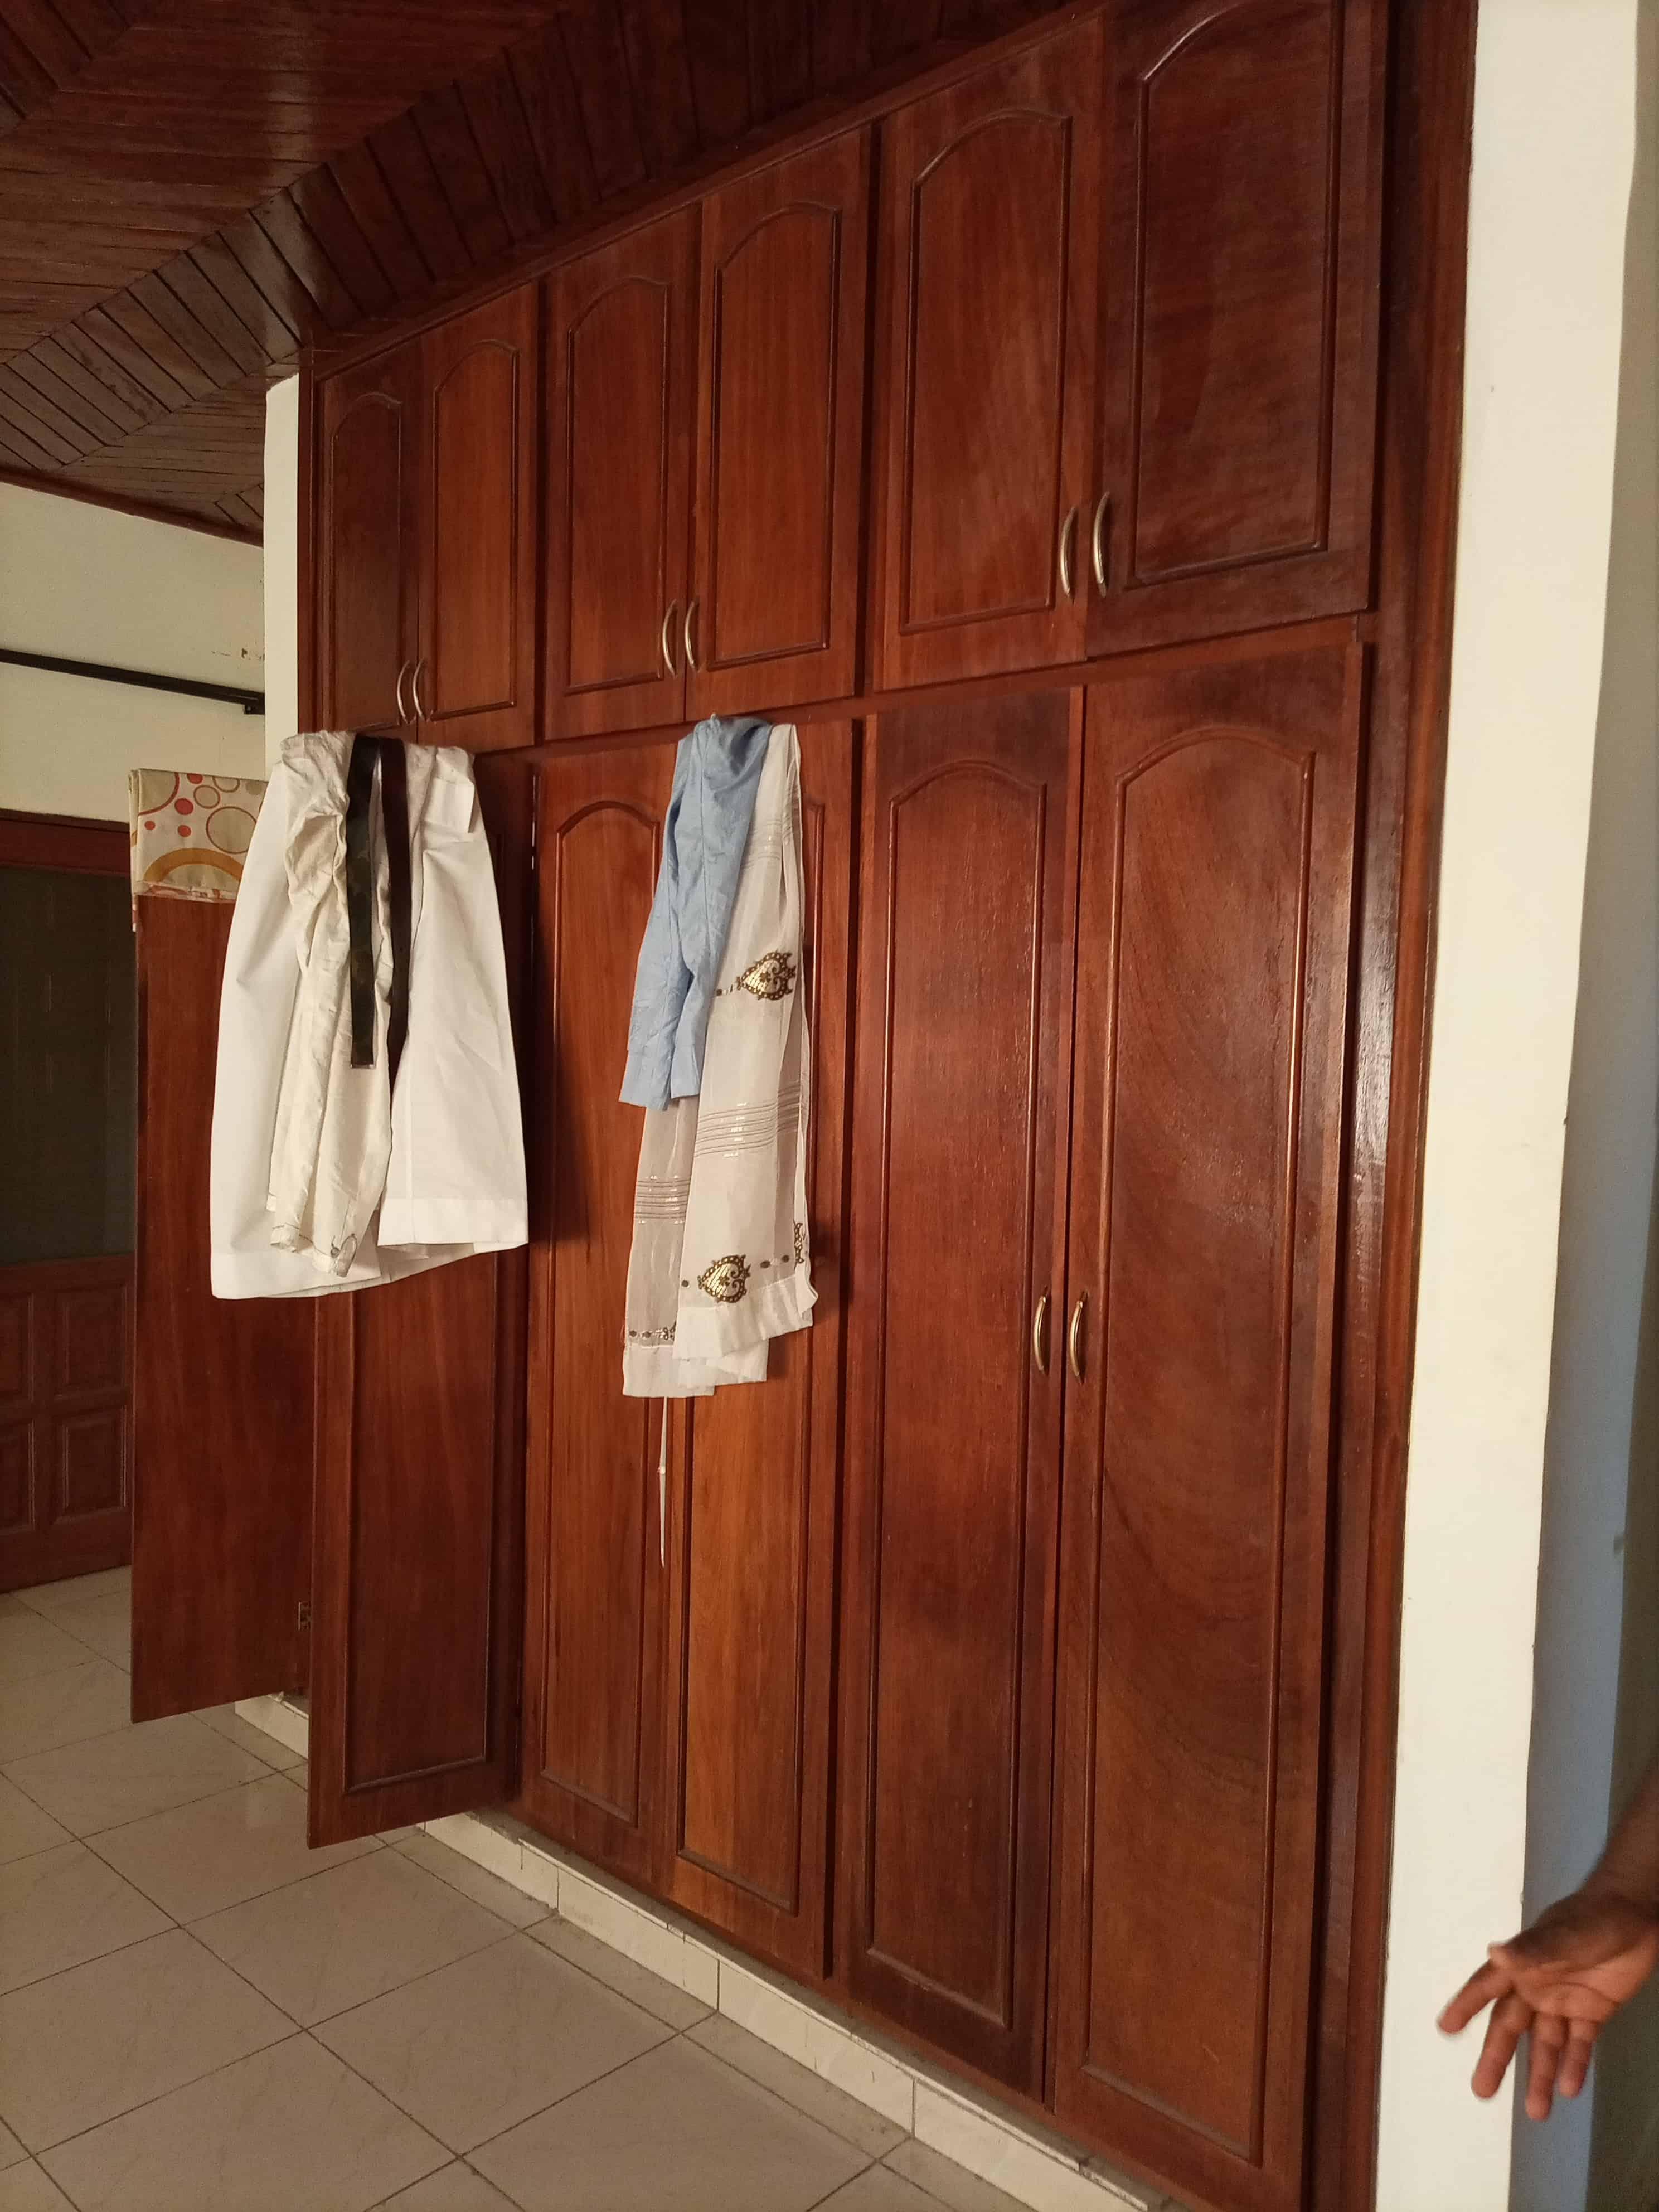 House (Duplex) to rent - Douala, Logpom, Ver hôpital des  sœur - 3 living room(s), 5 bedroom(s), 6 bathroom(s) - 500 000 FCFA / month